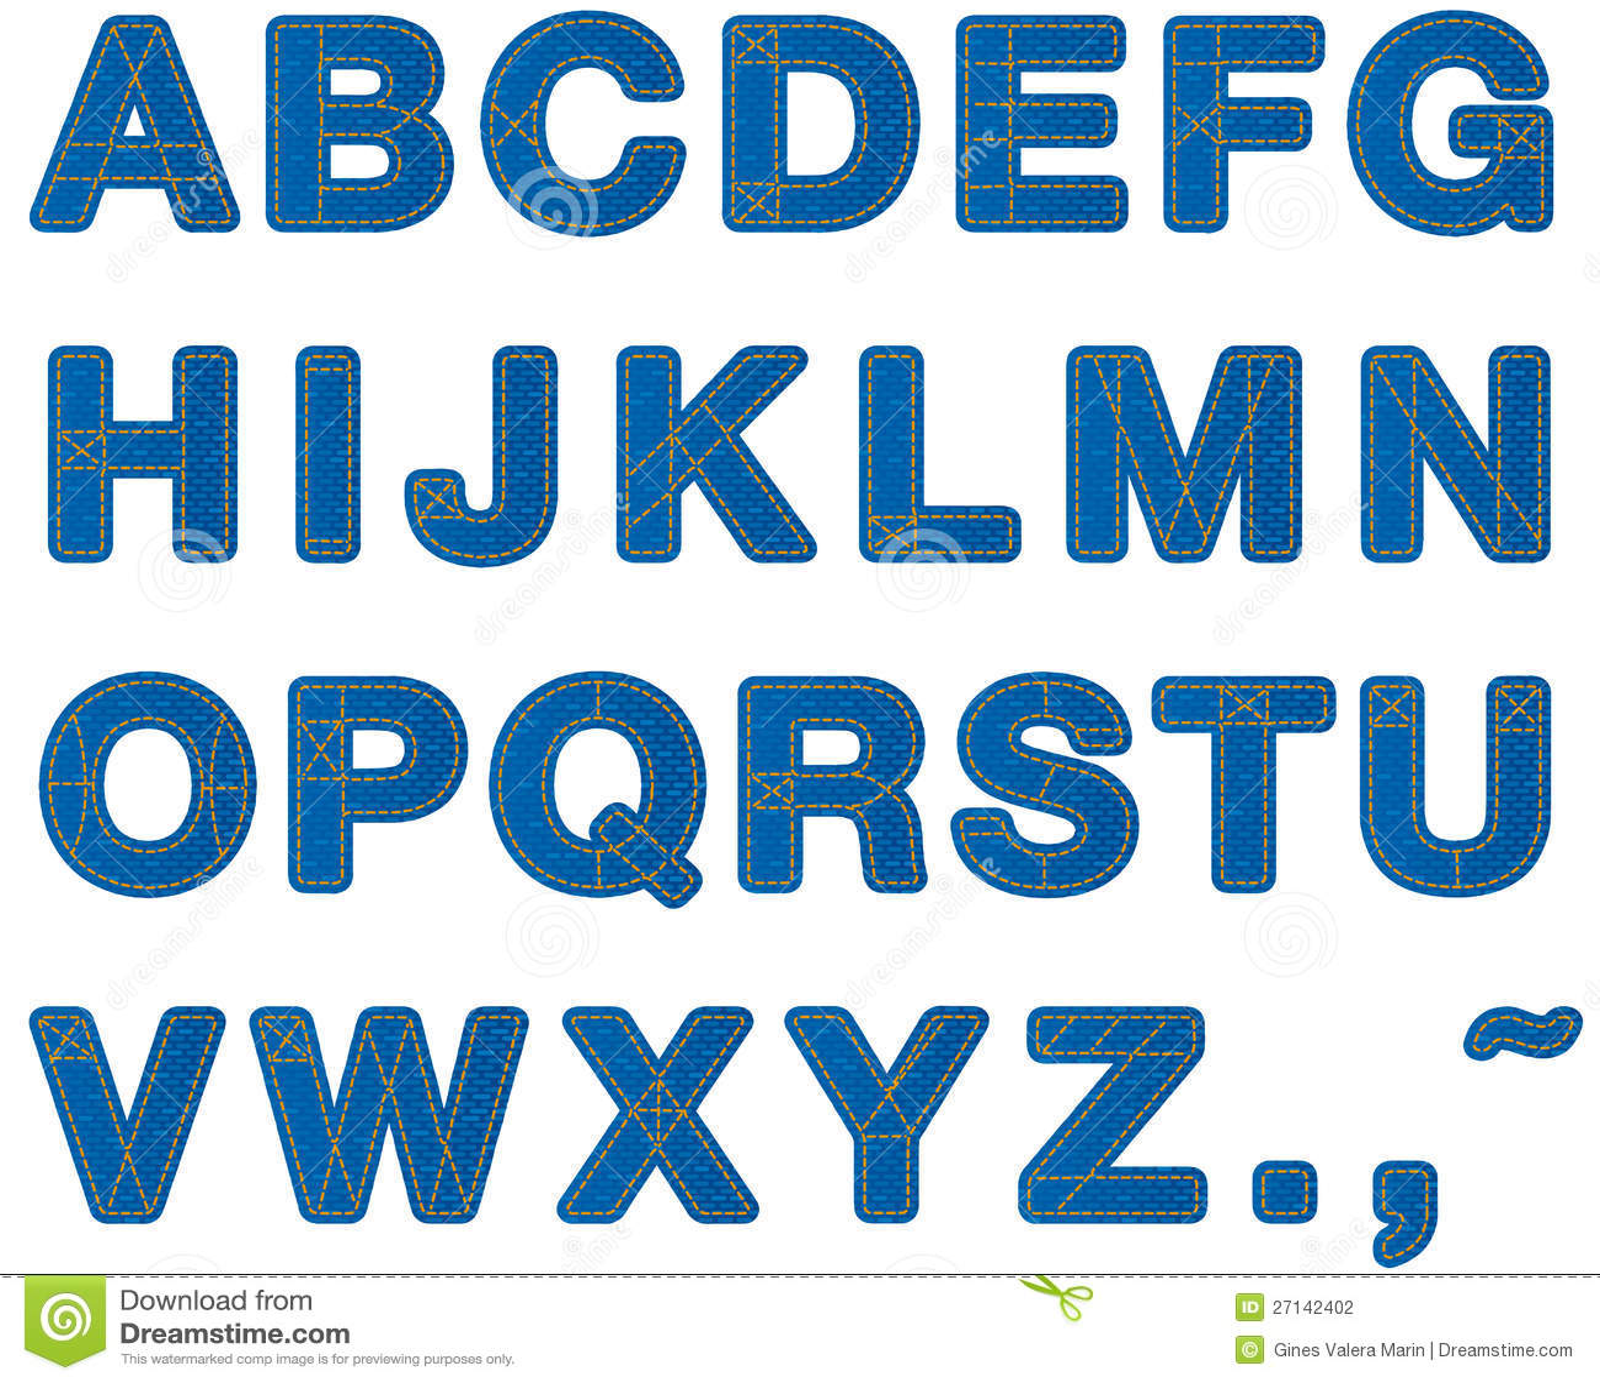 Jeans Alphabet Upper Case Stock Photography - Image: 27142402